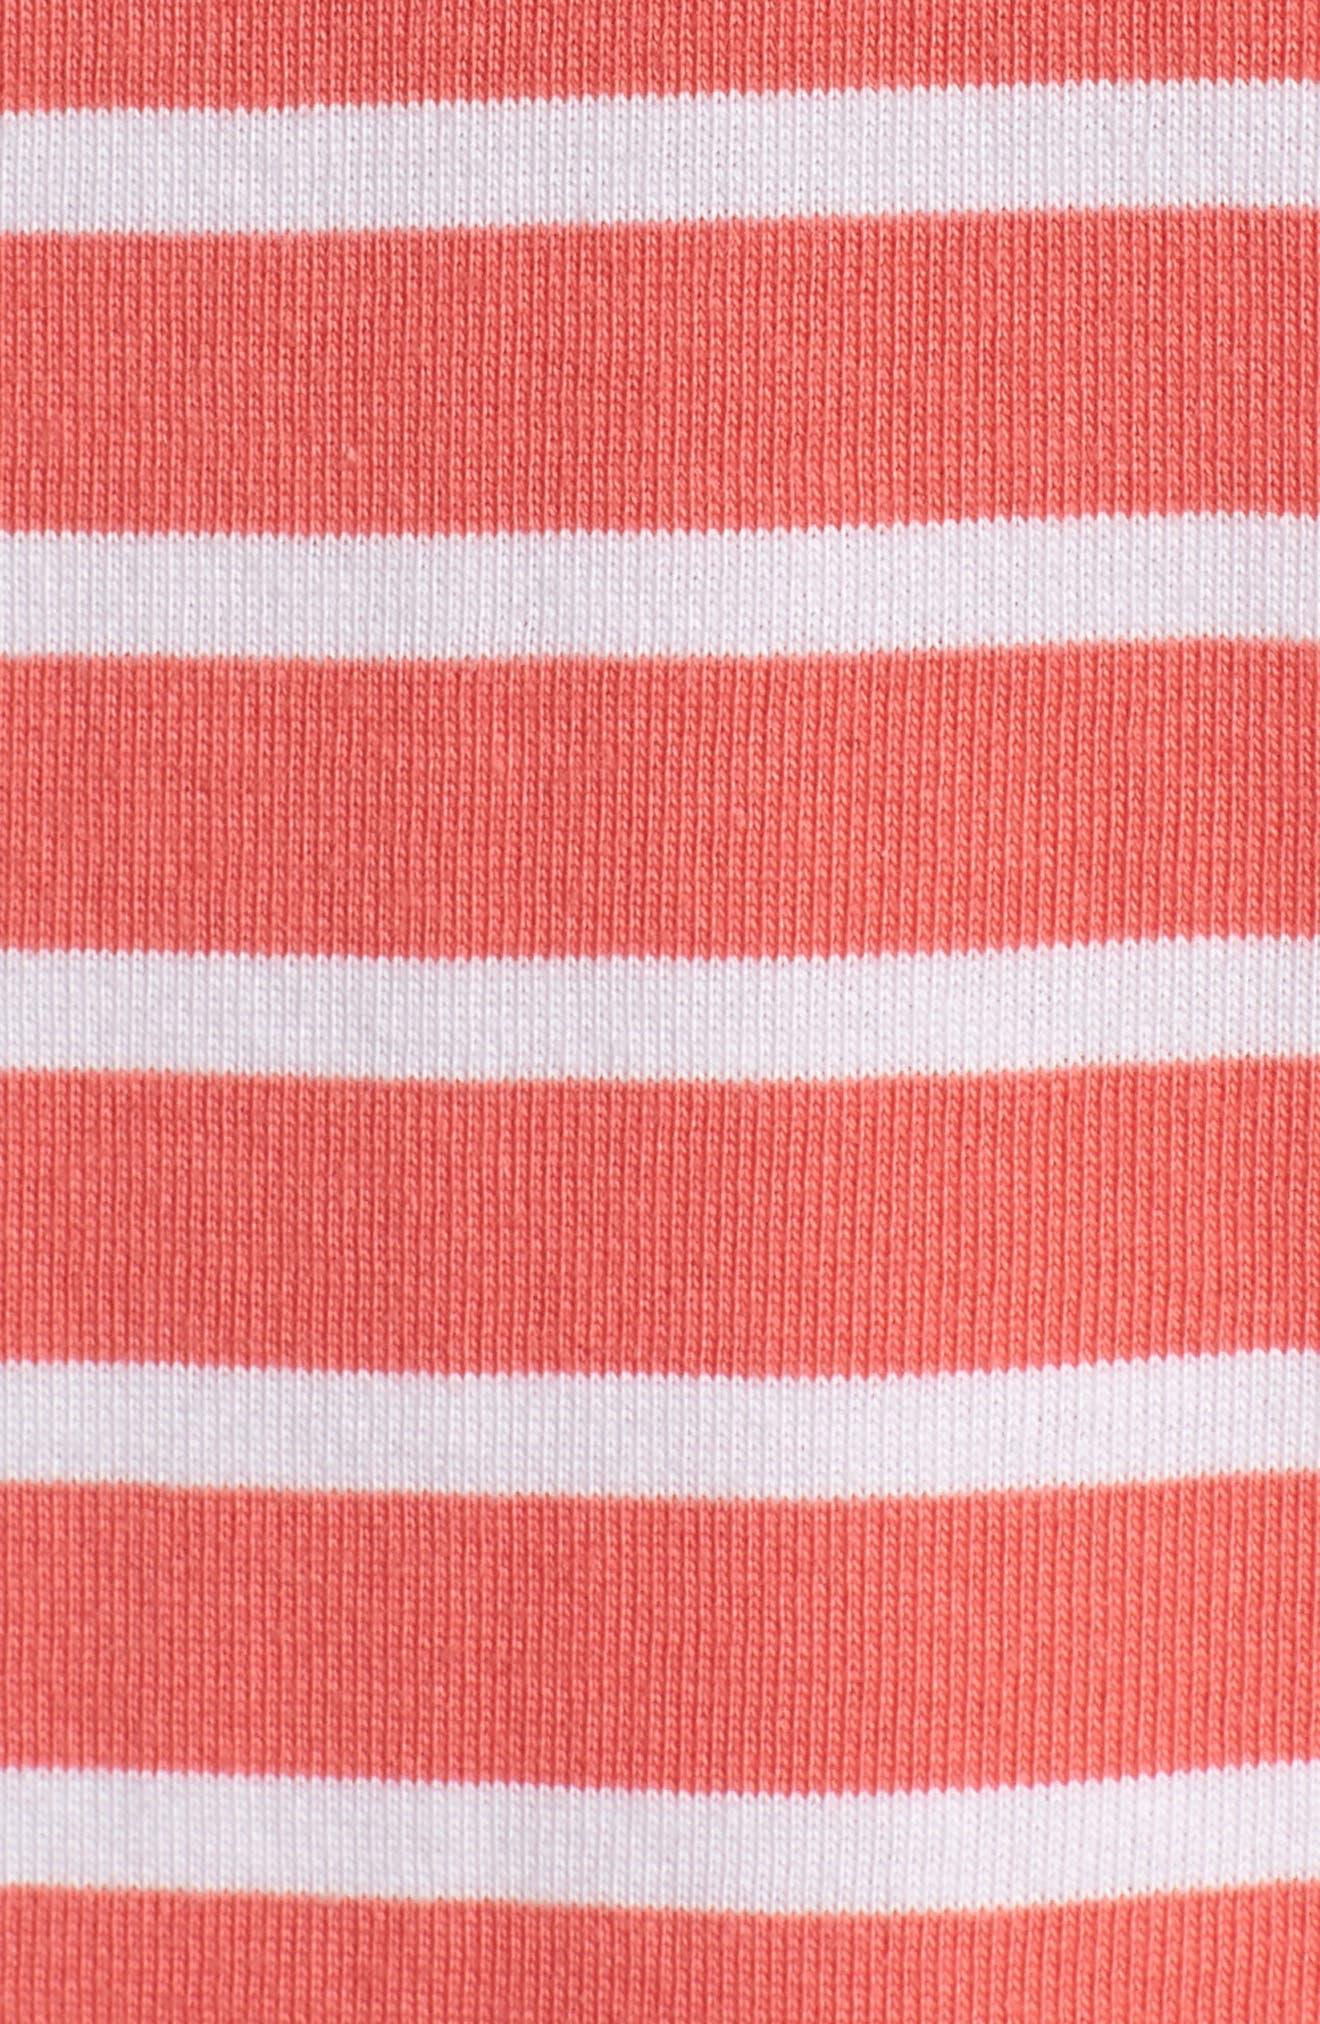 Stripe Cotton Knit Shift Dress,                             Alternate thumbnail 6, color,                             958